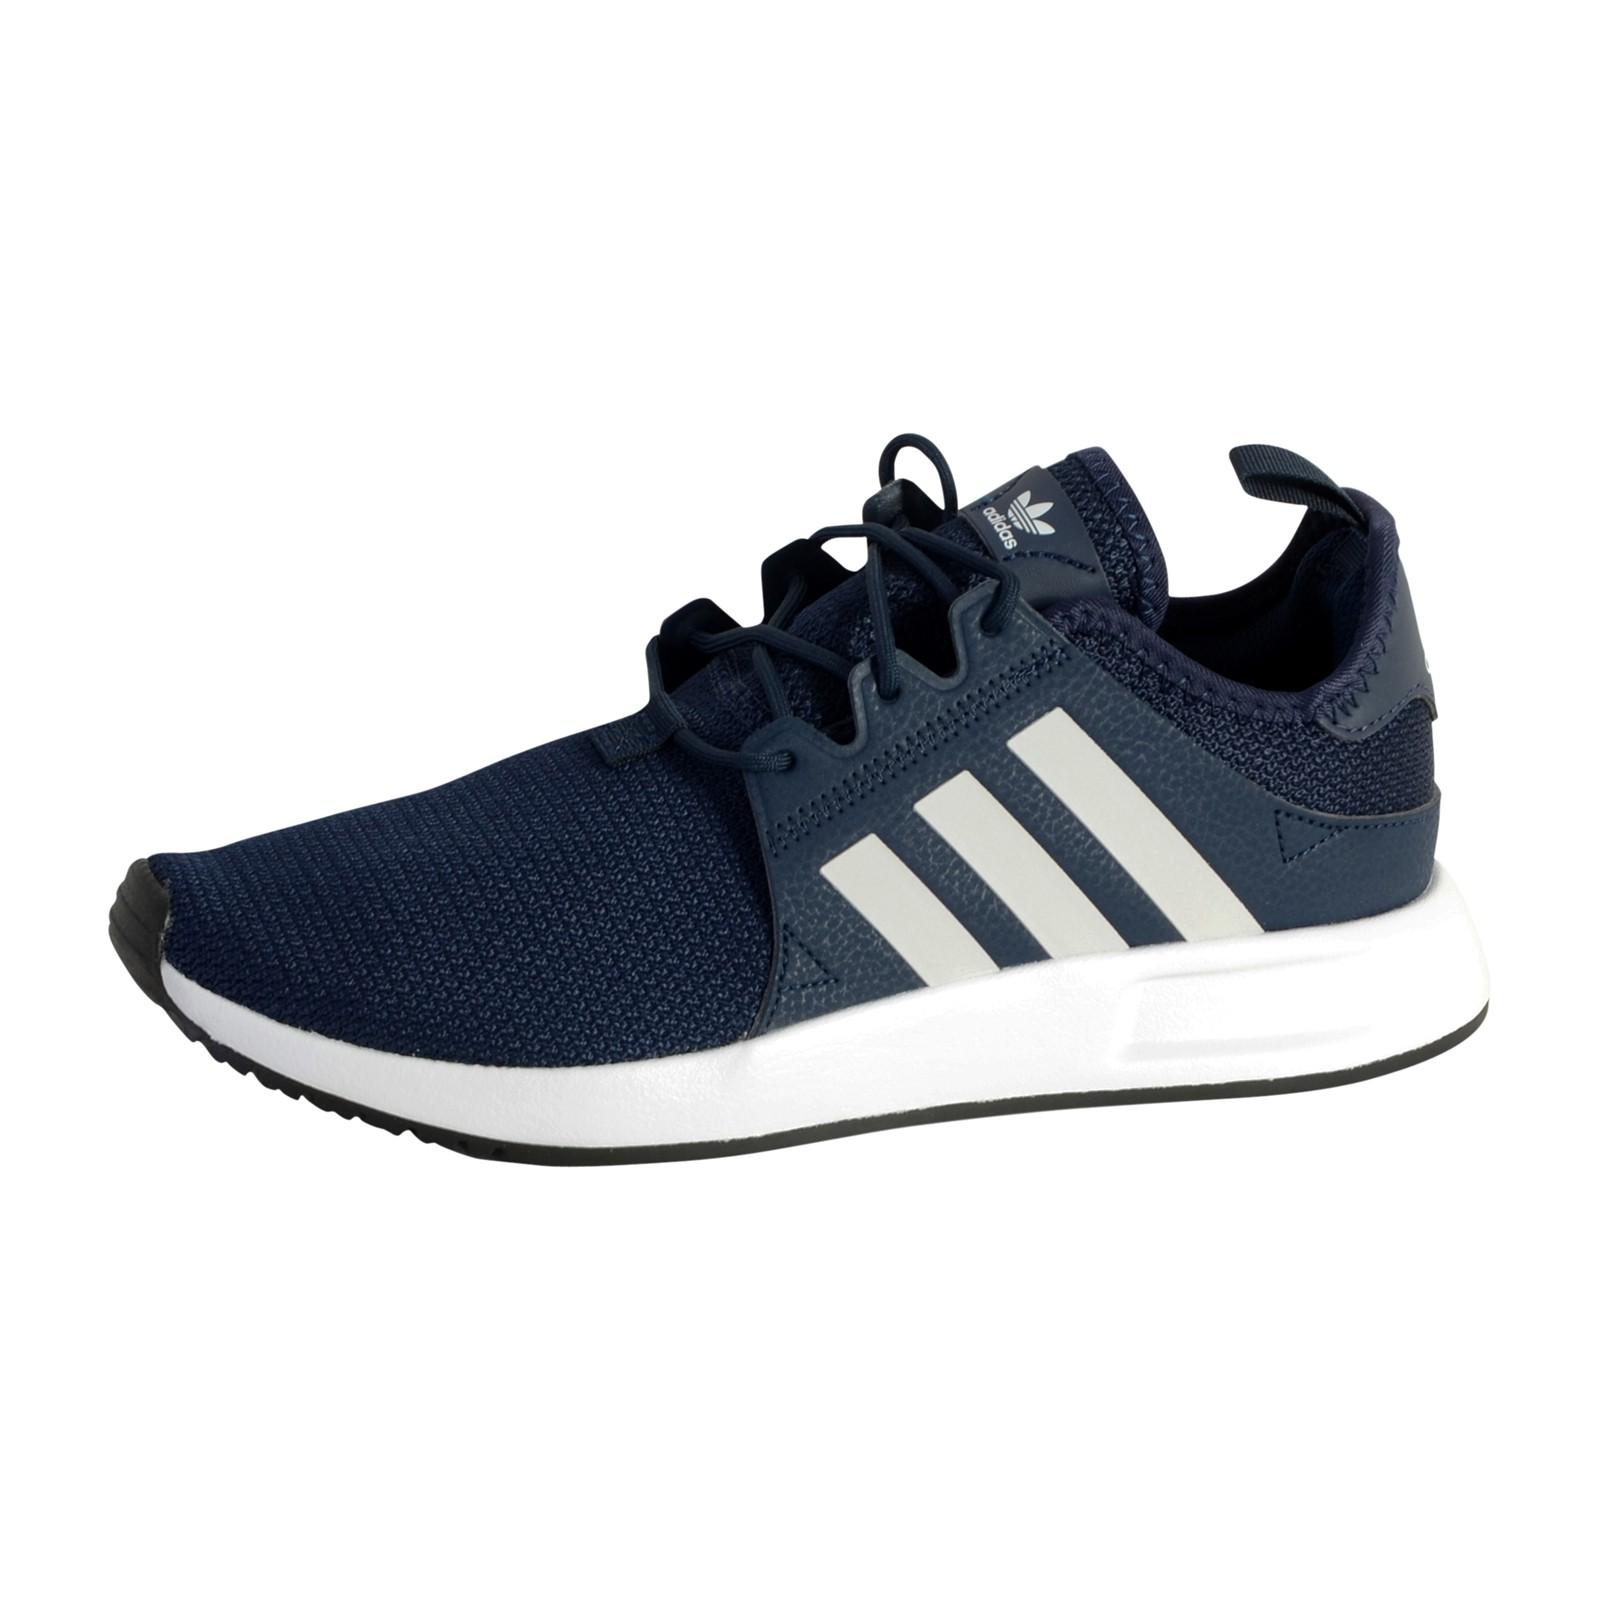 Bleu Cq2407 Ebay Baskets Foncé Originals Adidas 44 Plr X waAWIX